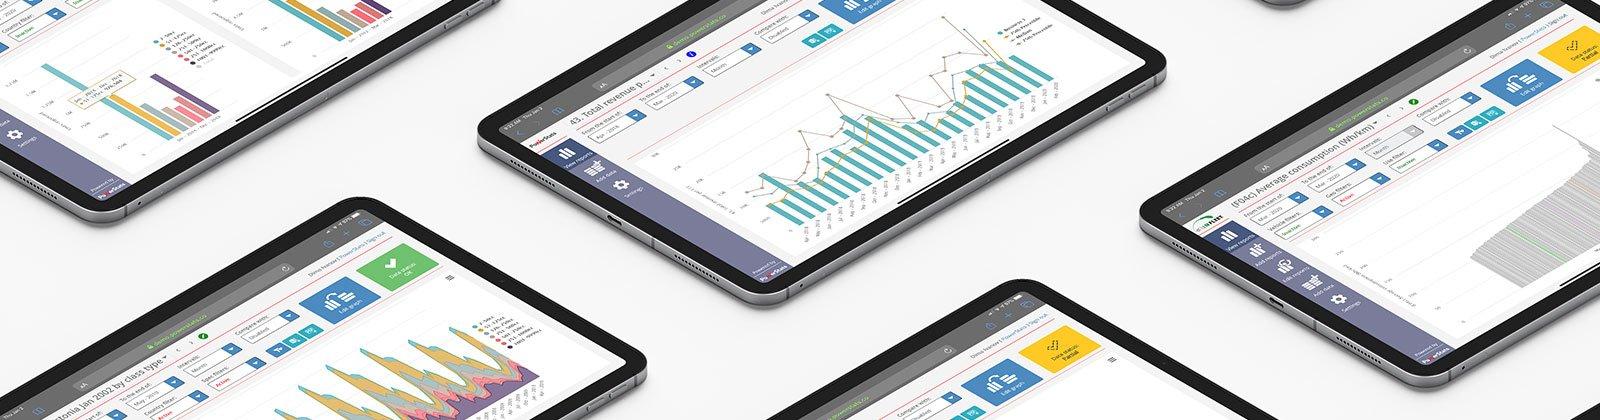 PowerStats_benchmarking_statistics_kpi_11